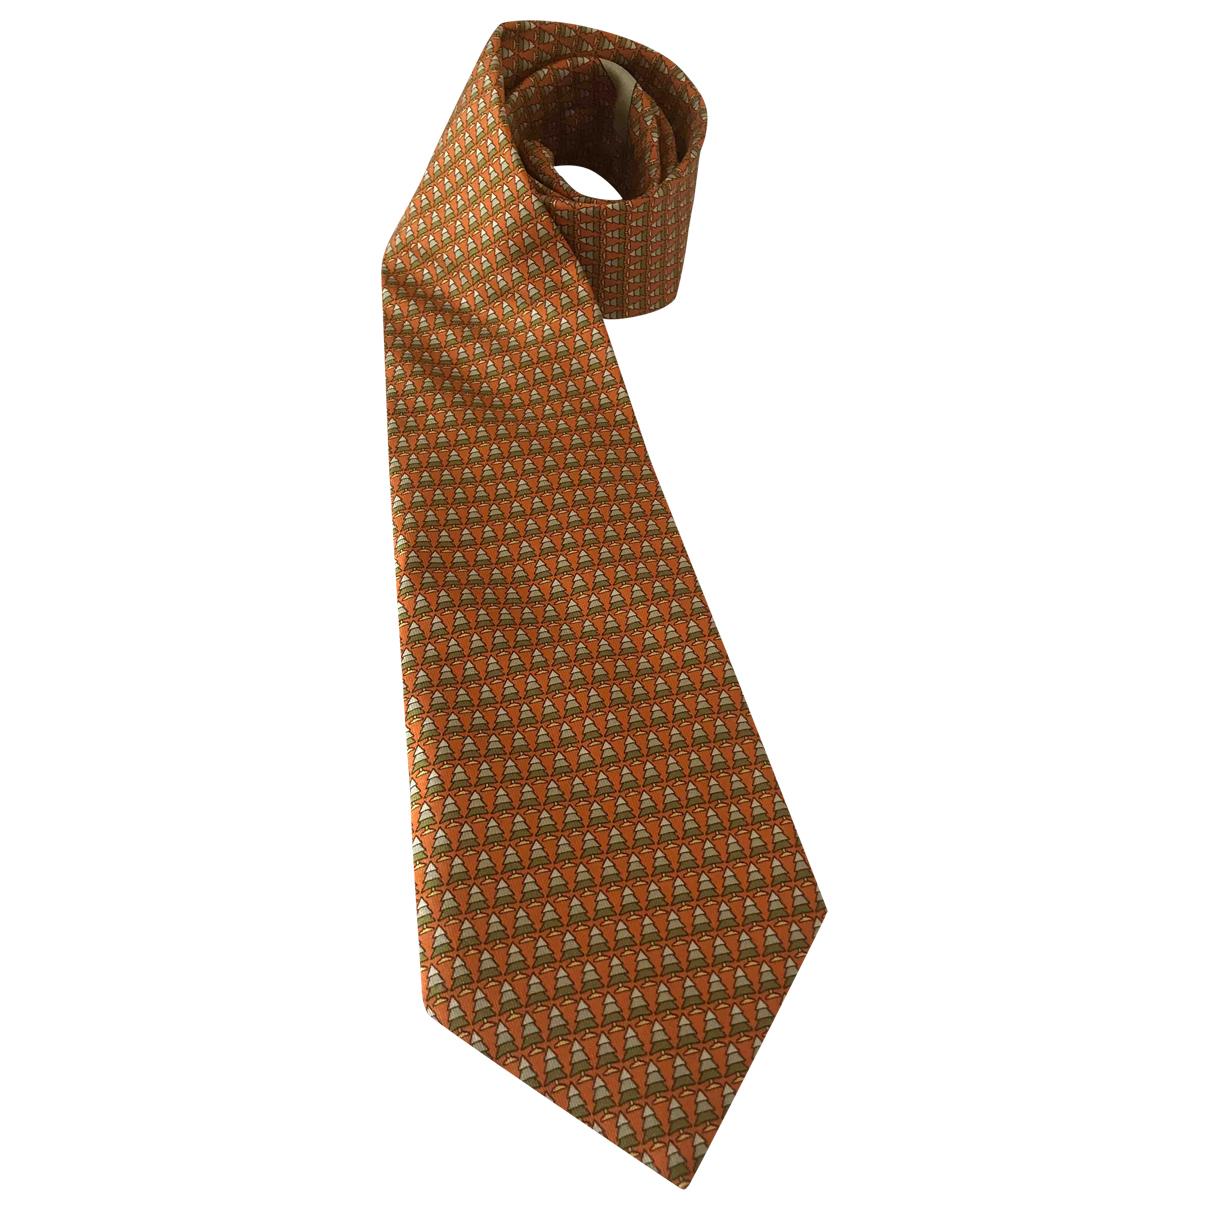 Salvatore Ferragamo N Silk Ties for Men N